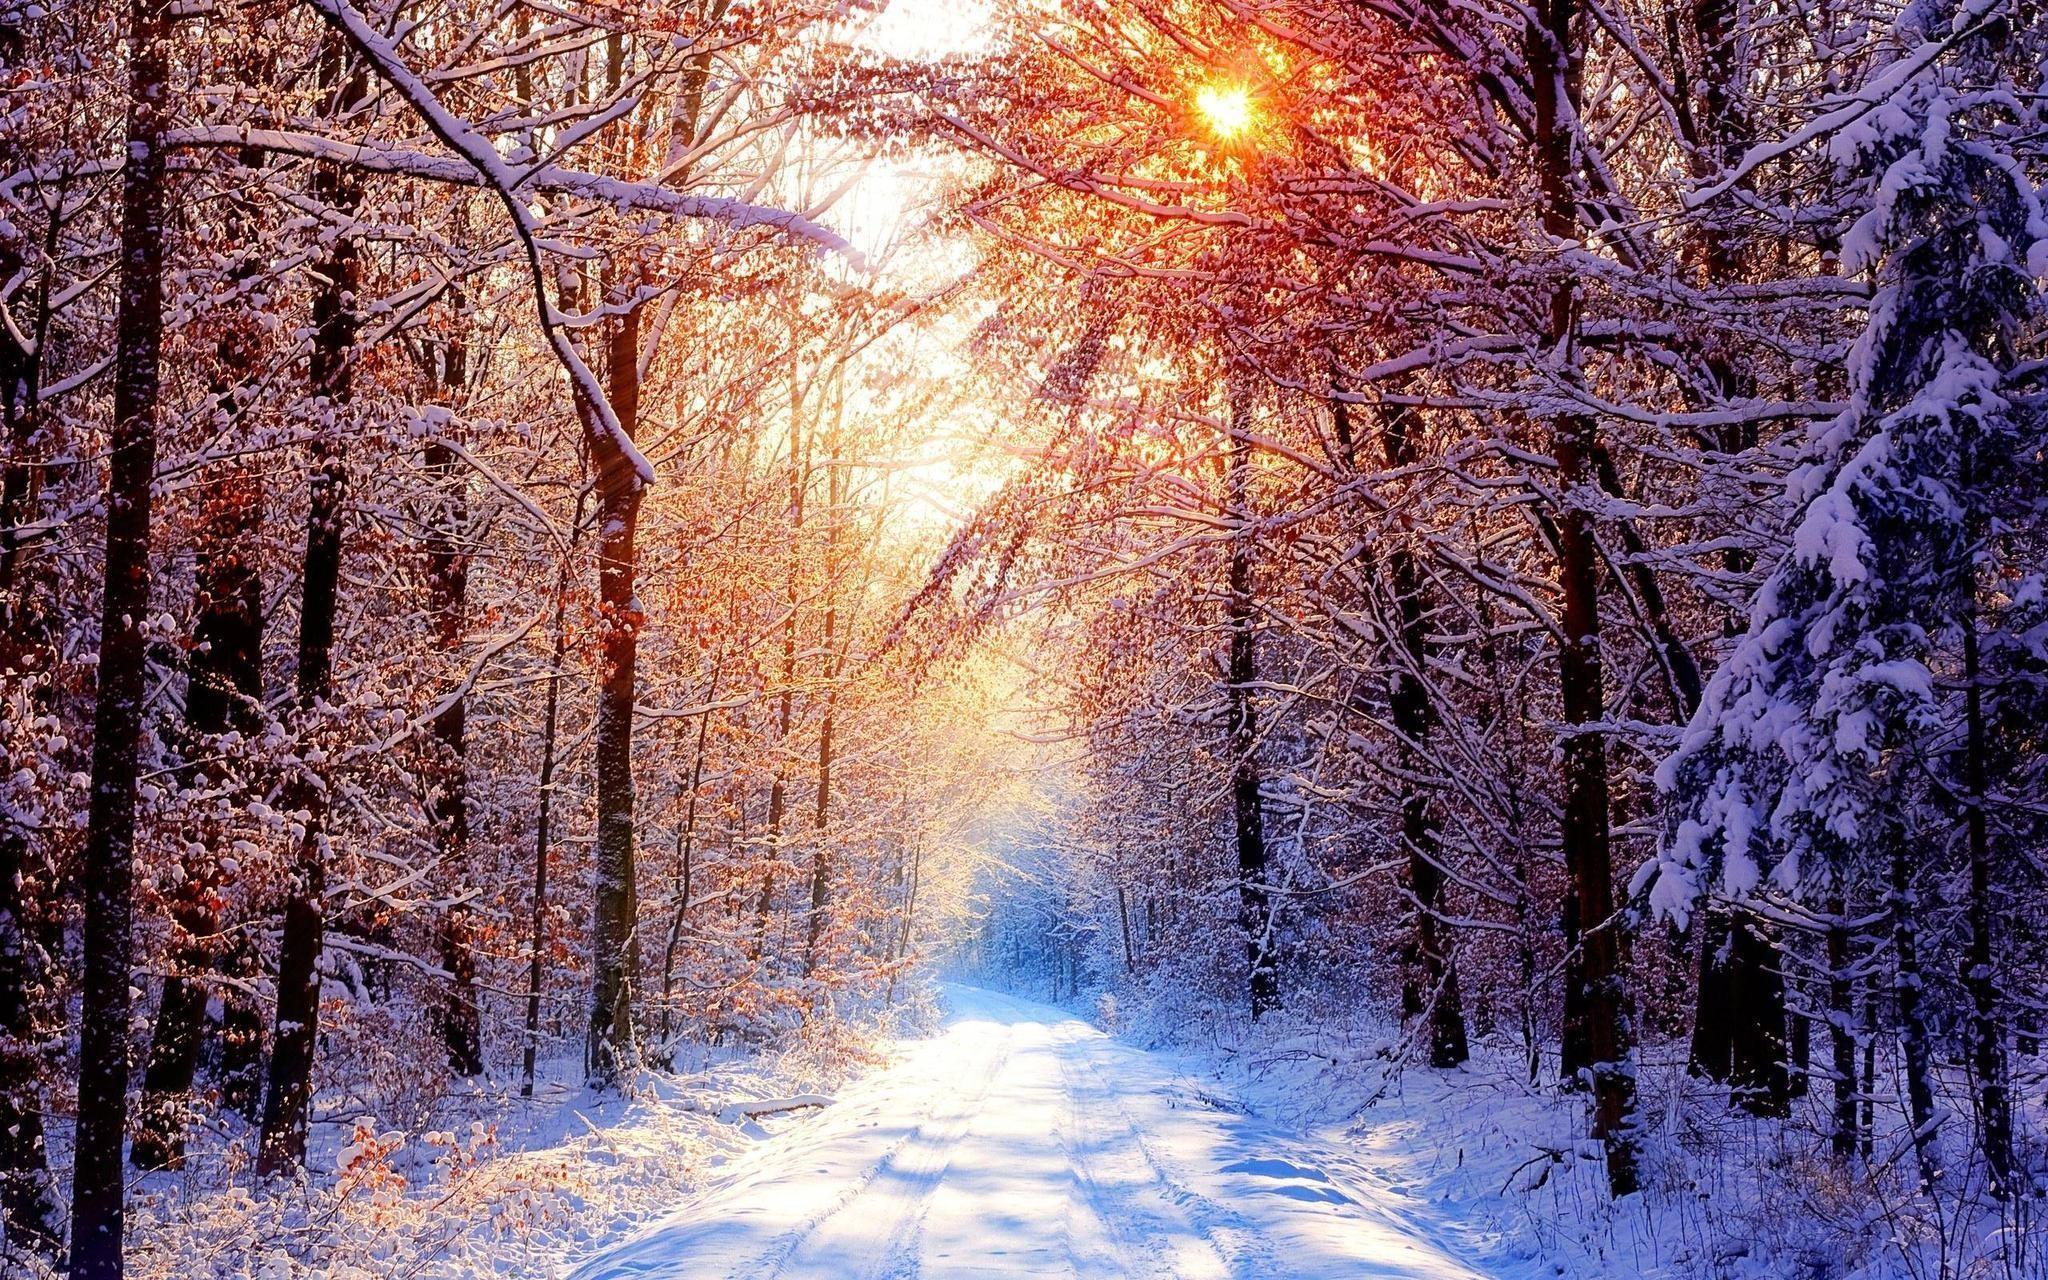 Snowy Winter Scenes Wallpaper (44+ images)